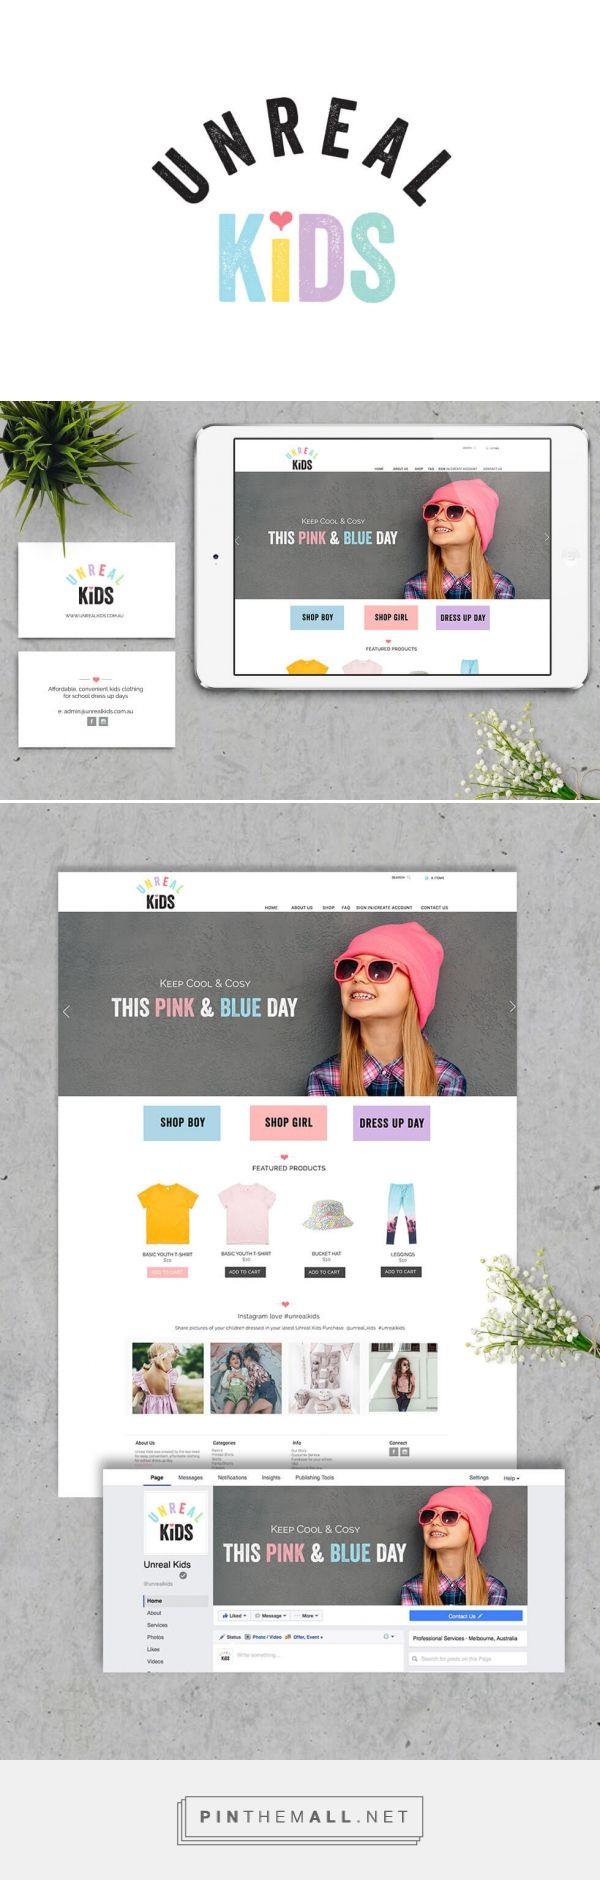 Affordable Web Design Sydney By Webcanny Is A Sydney Based Website Design Company And Google Partner P Affordable Web Design Website Design Company Web Design